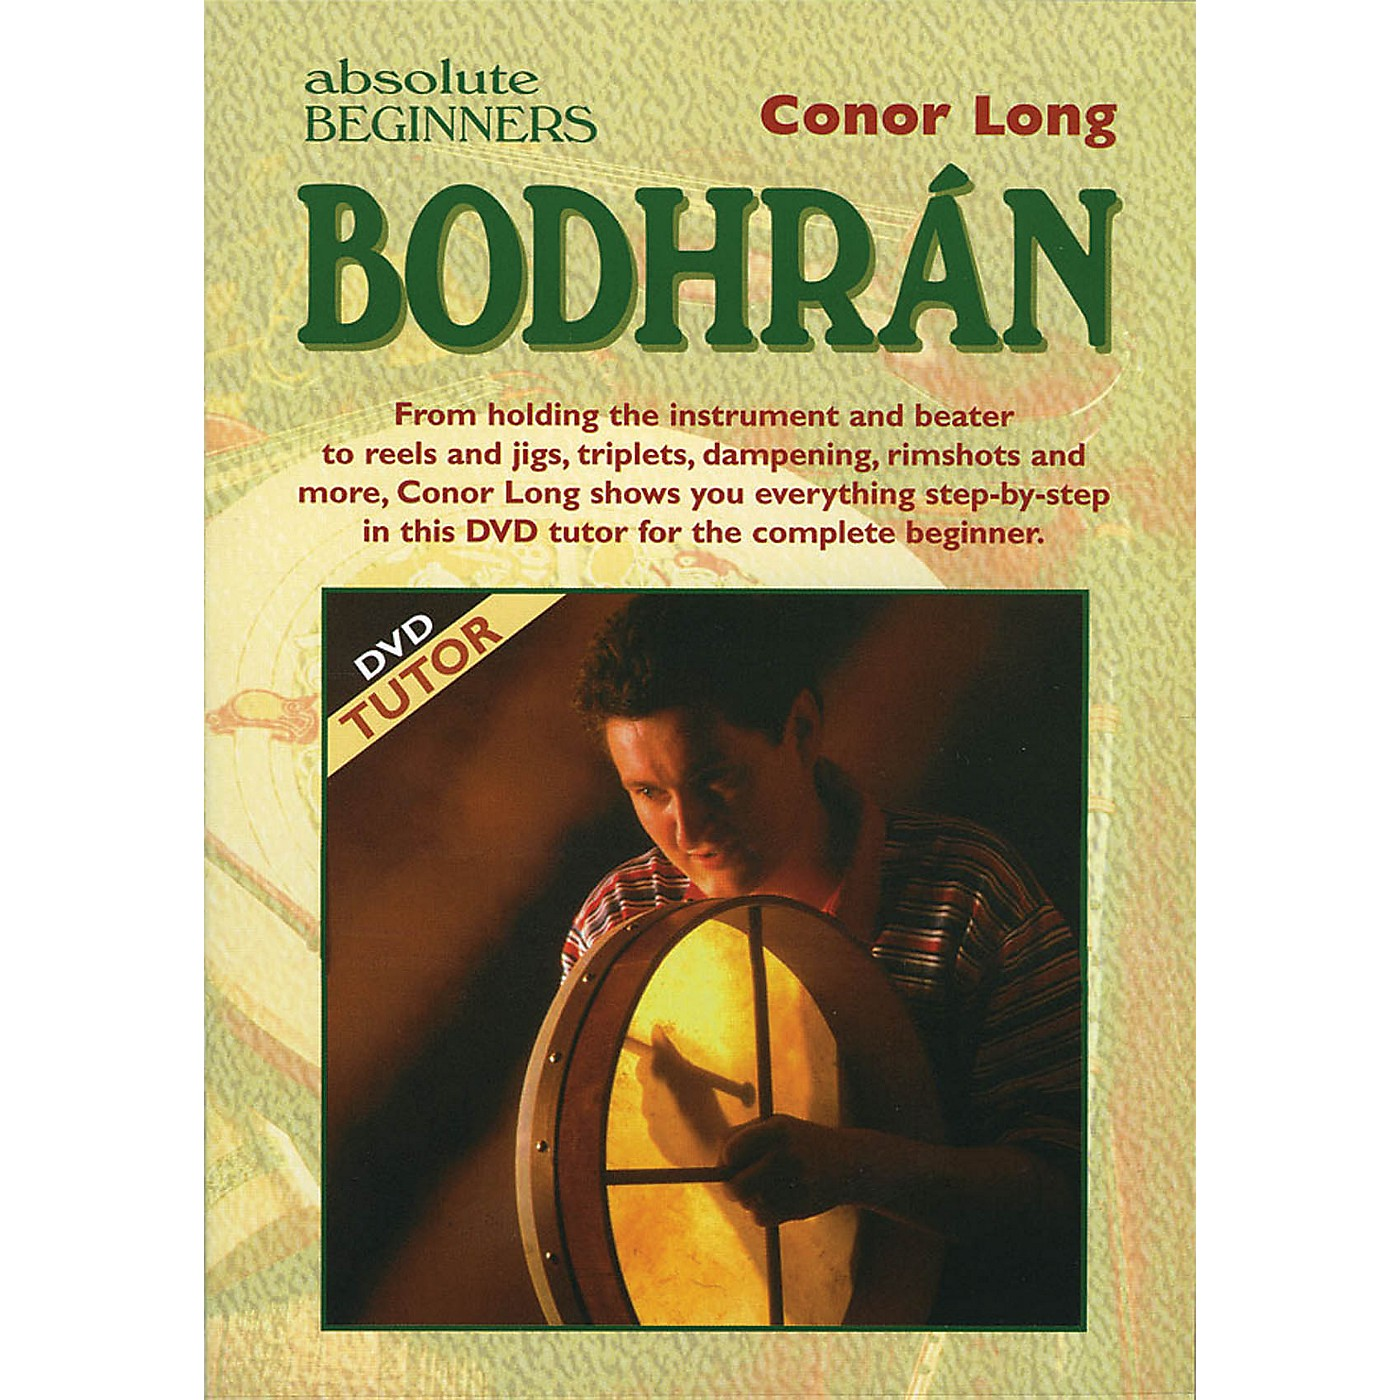 Waltons Absolute Beginners: Bodhrán Waltons Irish Music Dvd Series DVD Written by Conor Long thumbnail